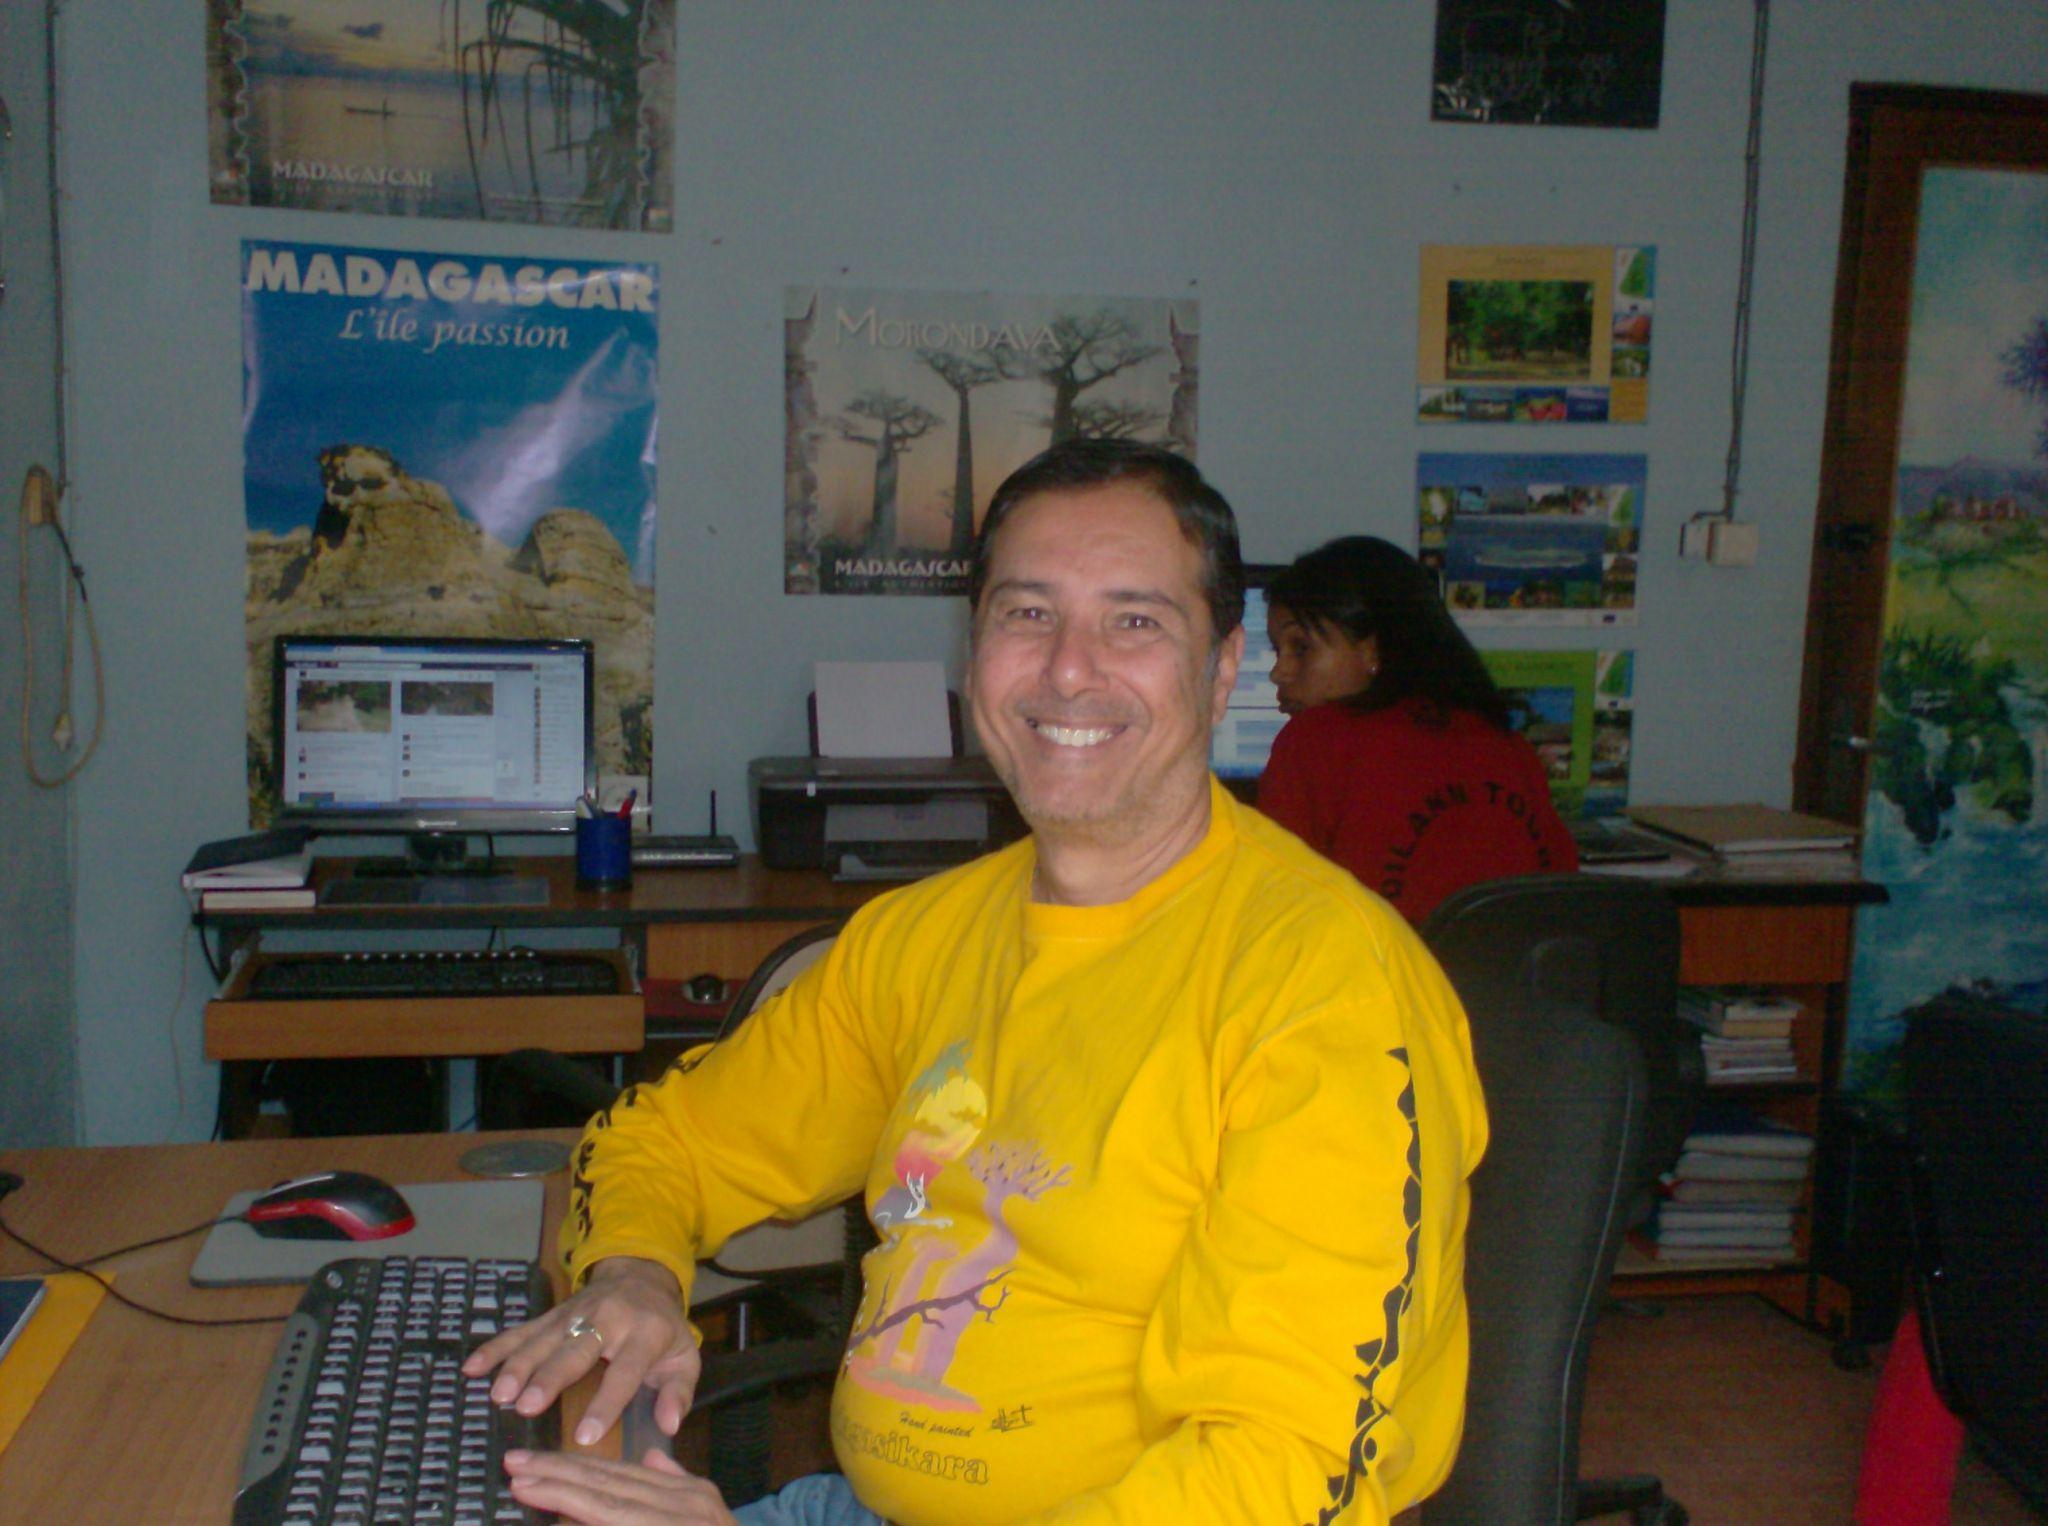 https://www.blog4ever-fichiers.com/2008/05/213567/artfichier_213567_4038420_20140824453342.jpg